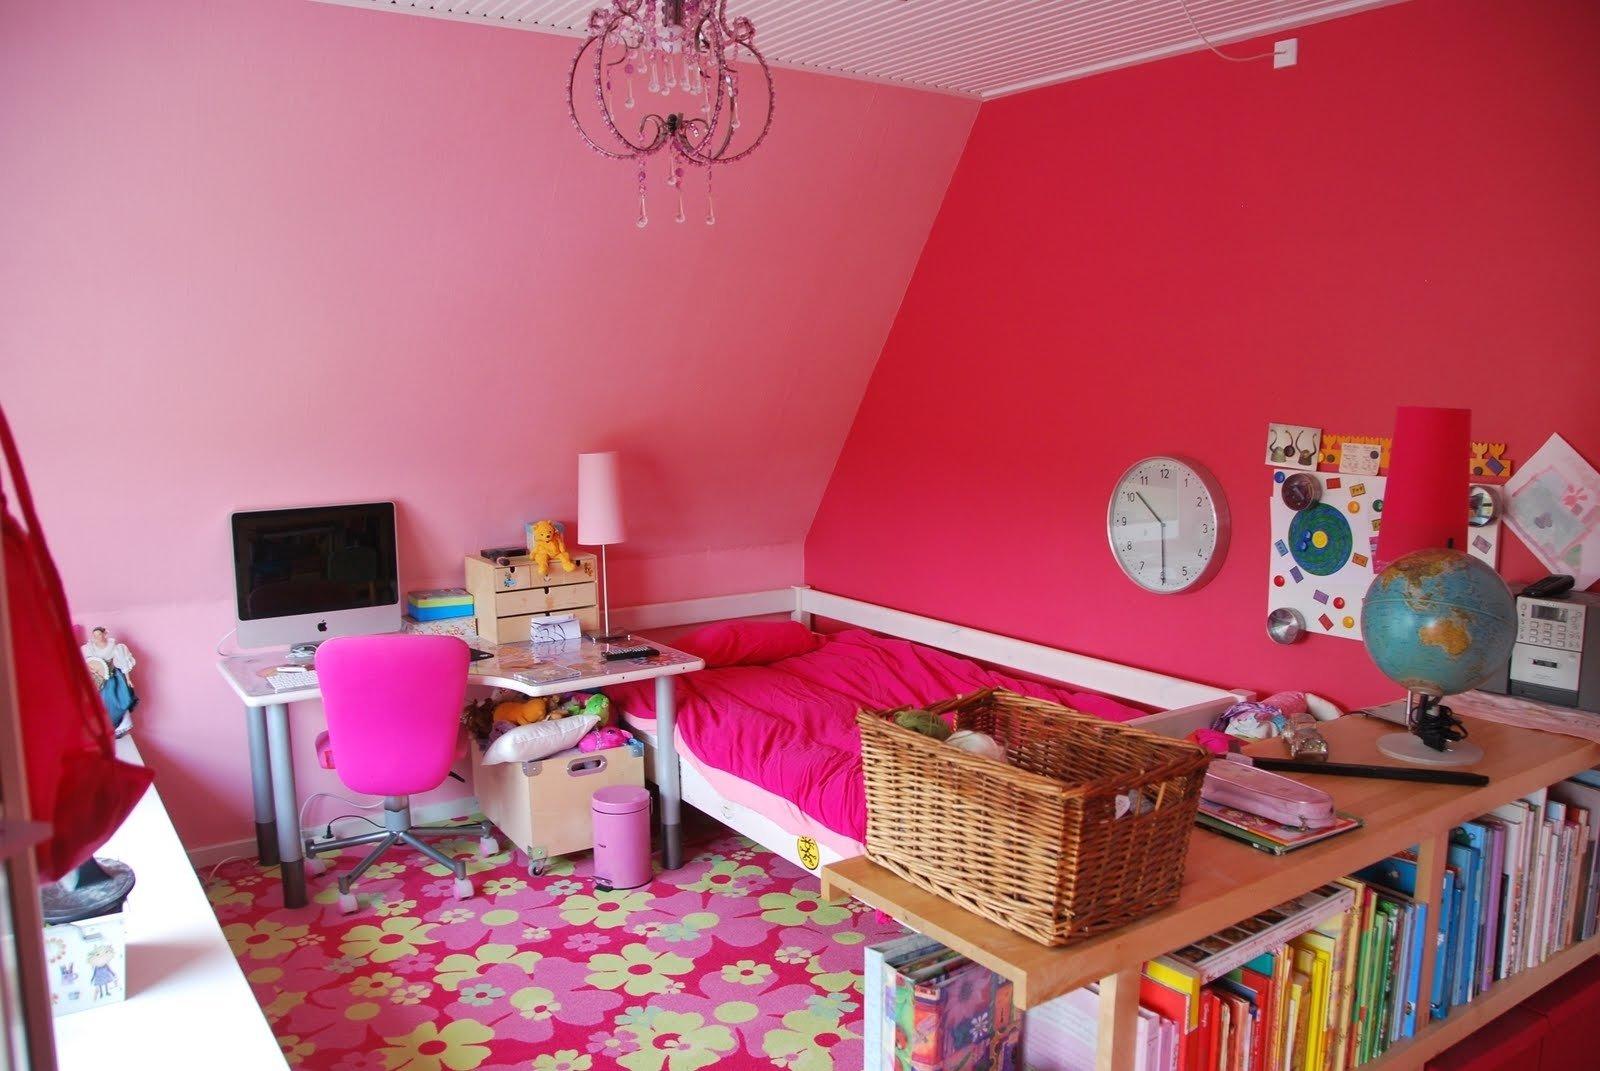 10 Cute Cute Ideas For Your Room cute teenage girl bedroom design ideas decobizz 2020